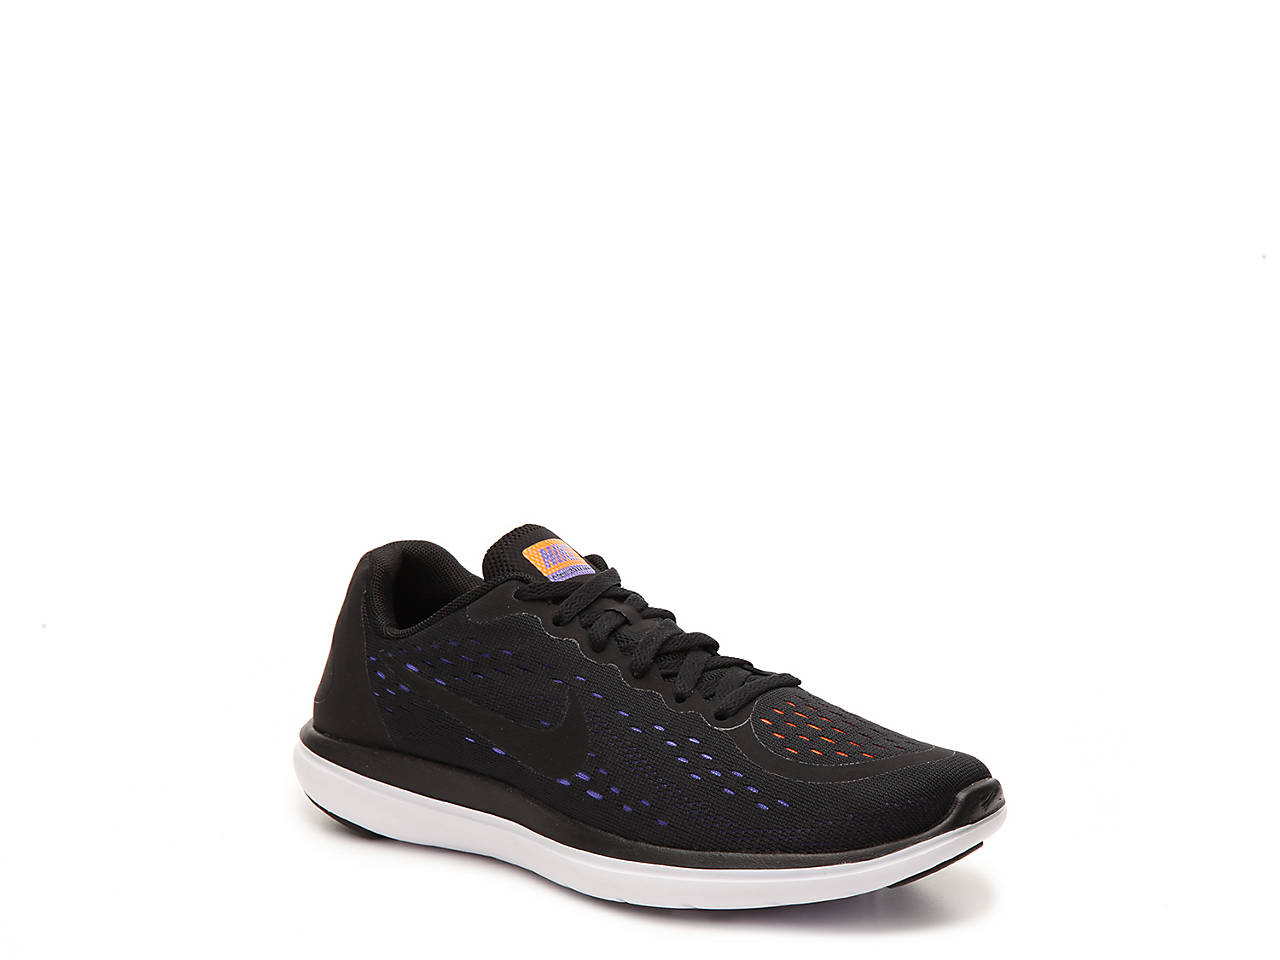 8206211a5e69 Nike Flex 2017 RN Toddler   Youth Running Shoe Kids Shoes